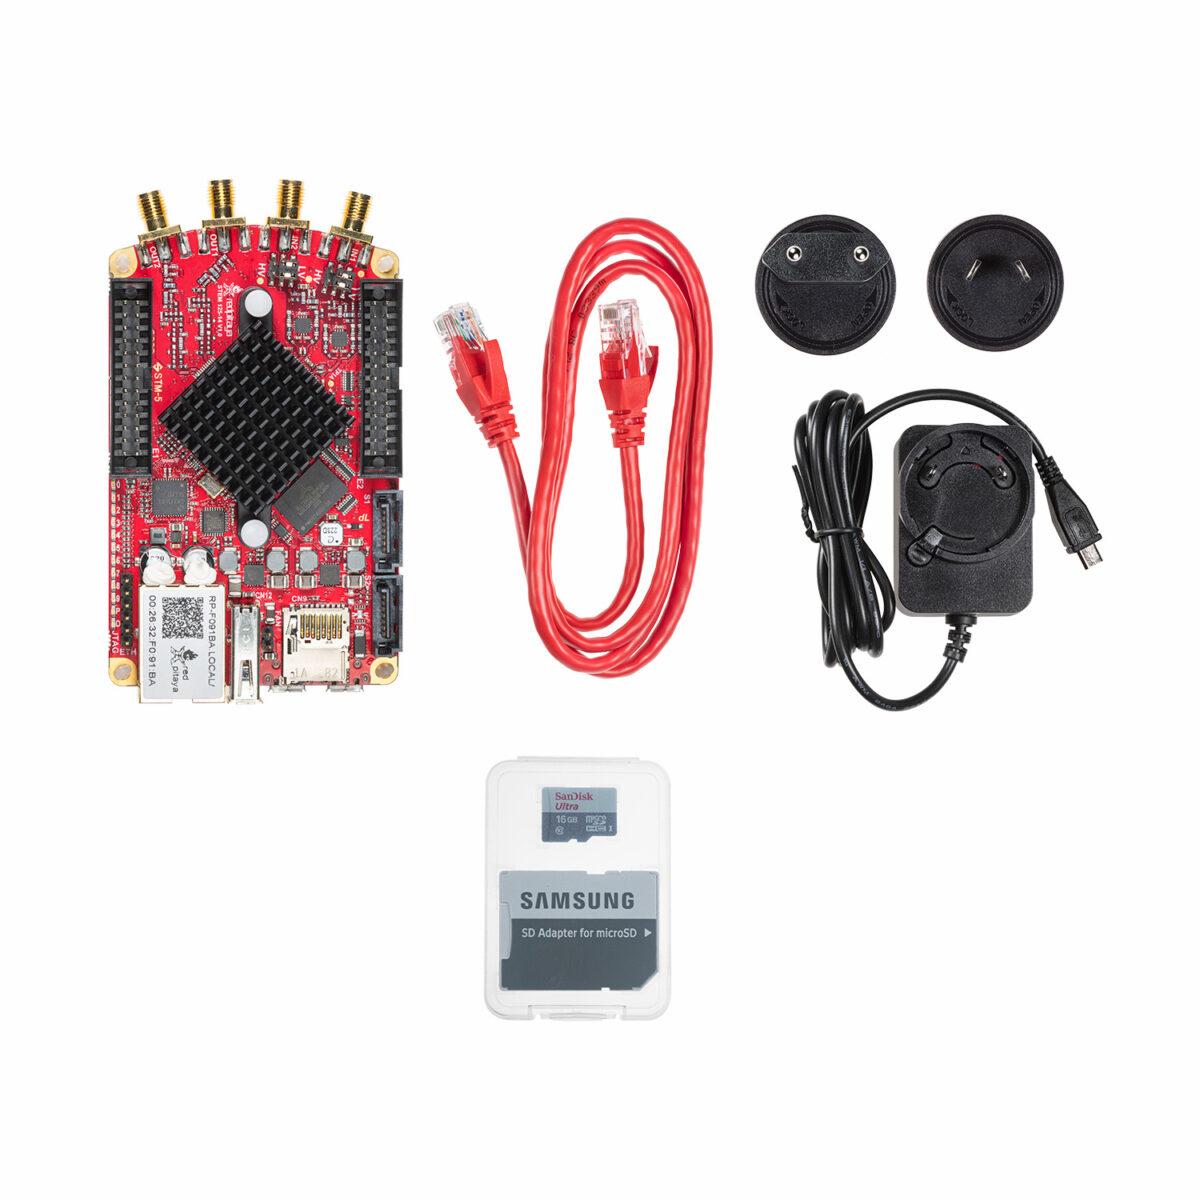 STEMlab 125-10 starter kit